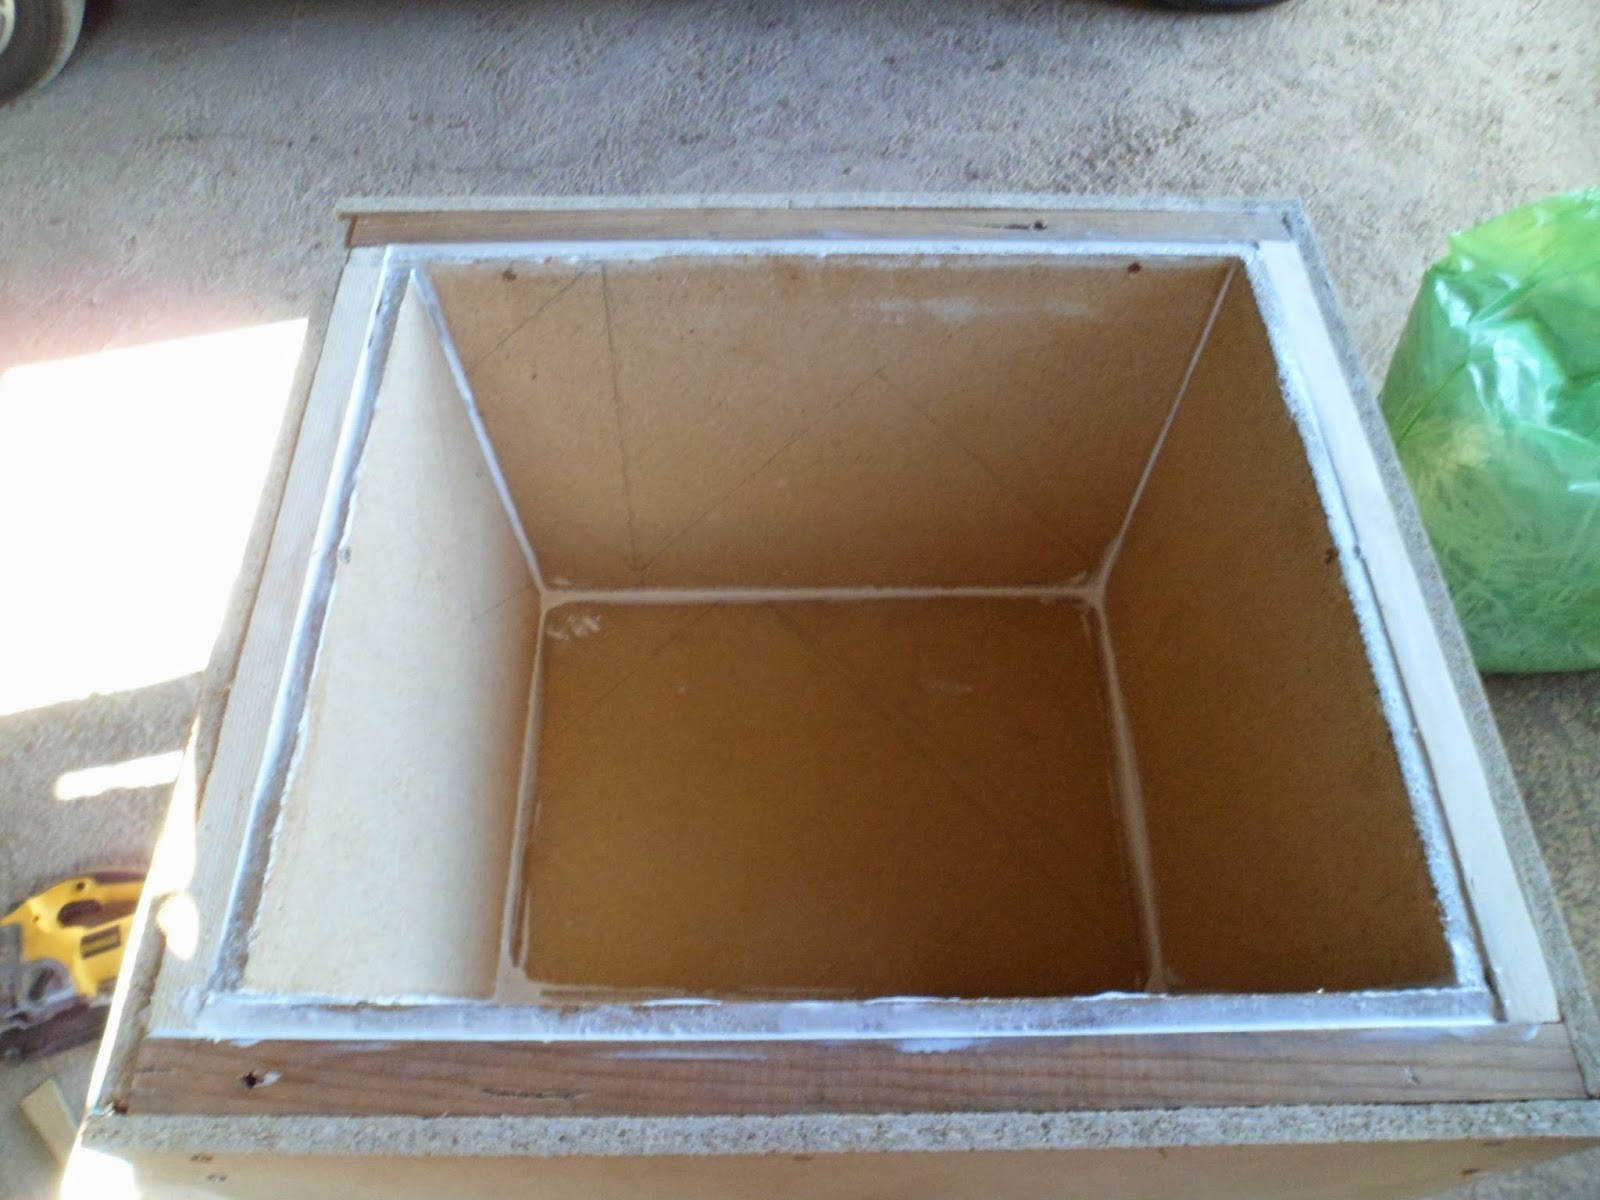 Fabriqu un horno solar no el ctrico taringa for Aislante termico para hornos